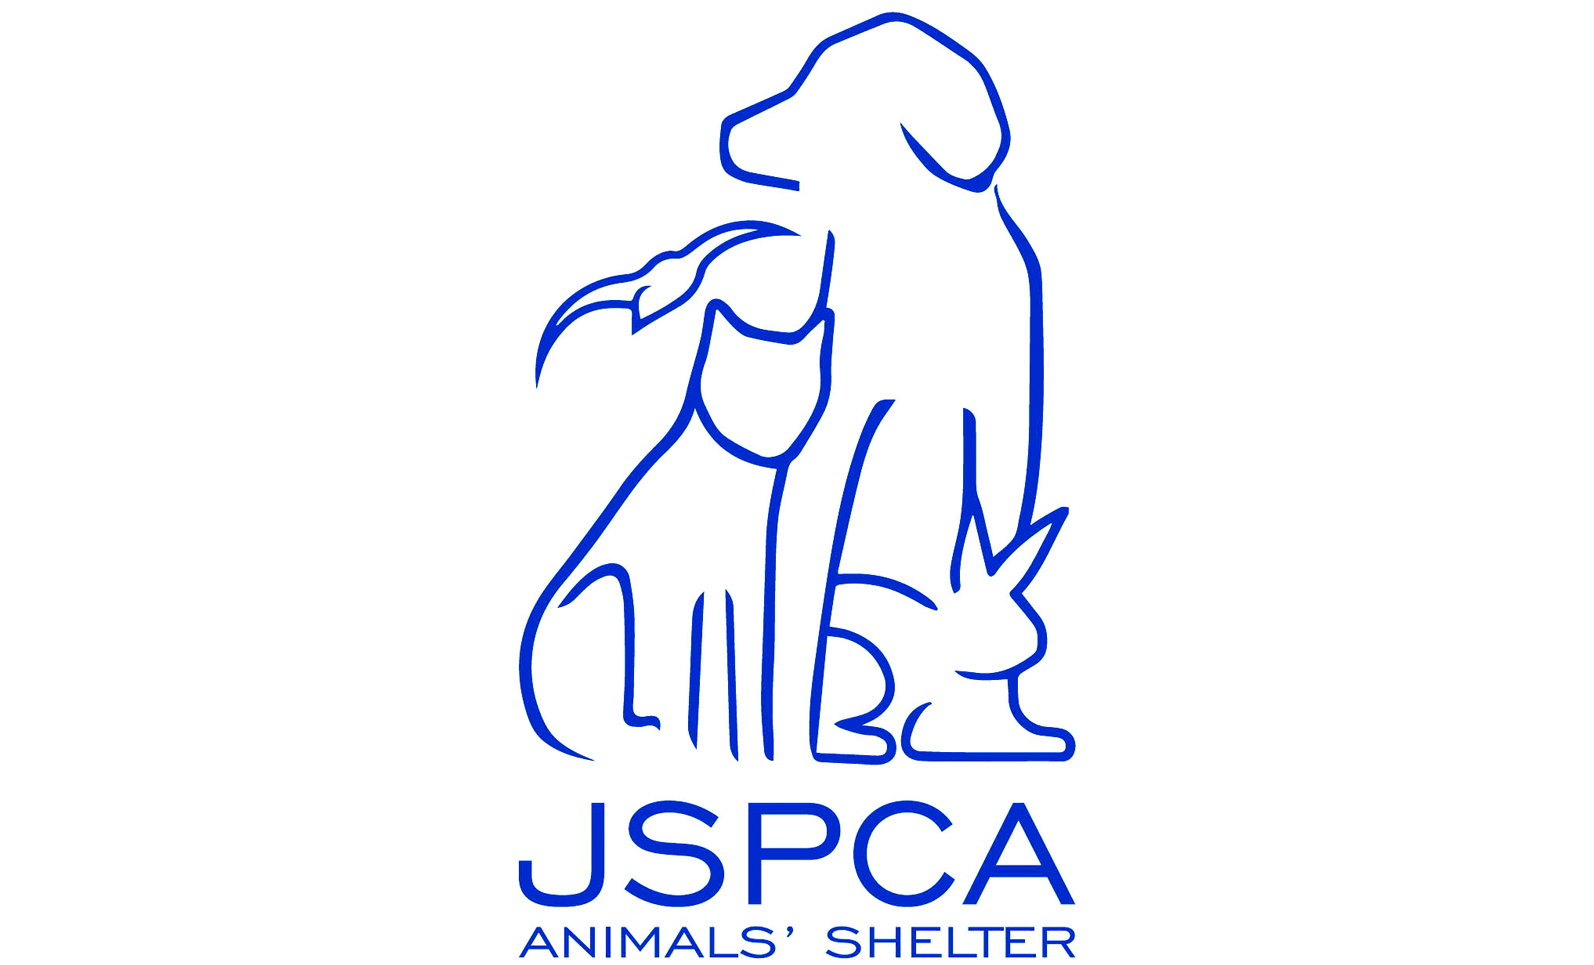 JSPCA Animal Shelter logo